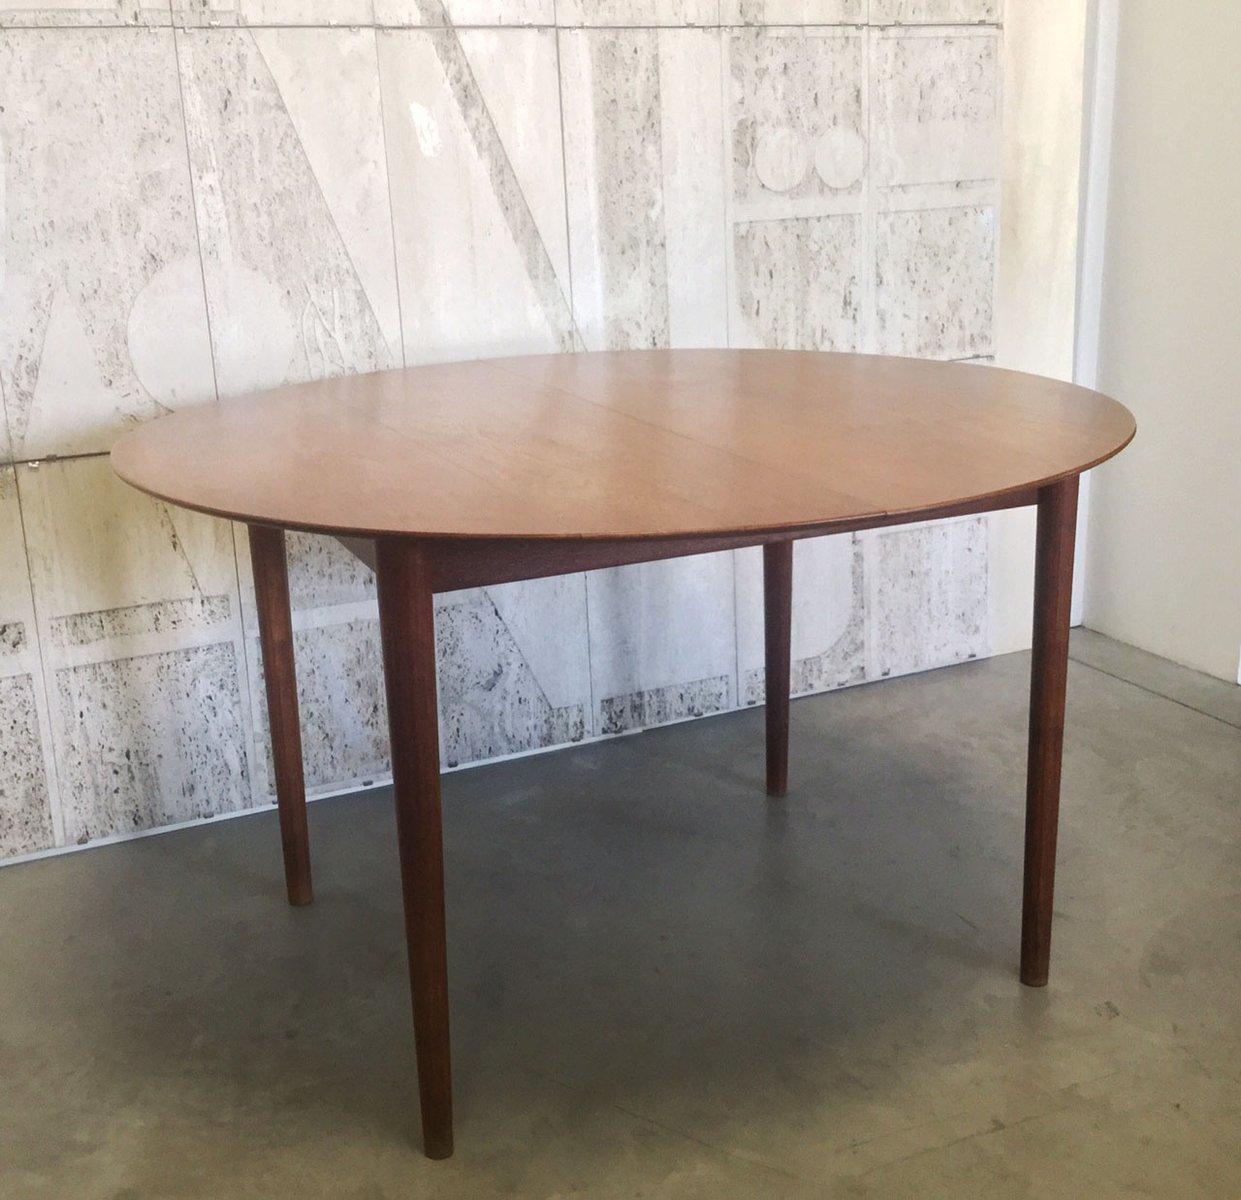 Tavolo da pranzo allungabile vintage, Danimarca in vendita su Pamono